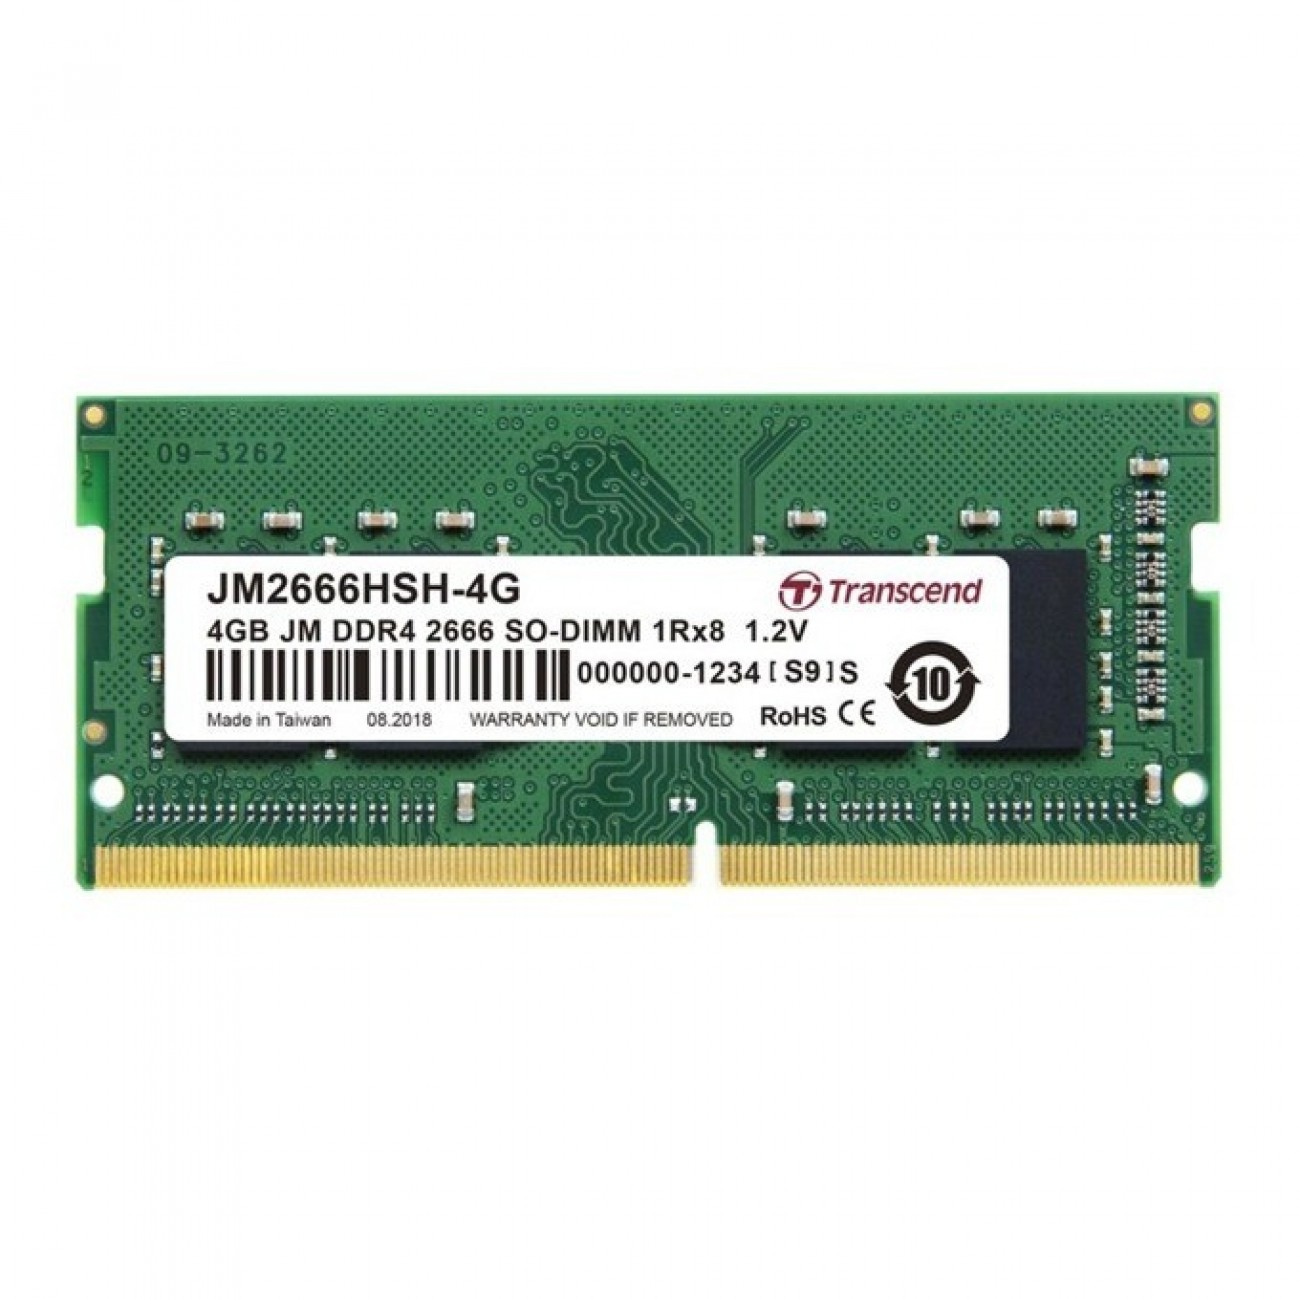 Памет 4GB DDR4 2666MHz, SO-DIMM, Transcend JM2666HSH-4G, 1.2V в Лаптоп Памети - Transcend | Alleop